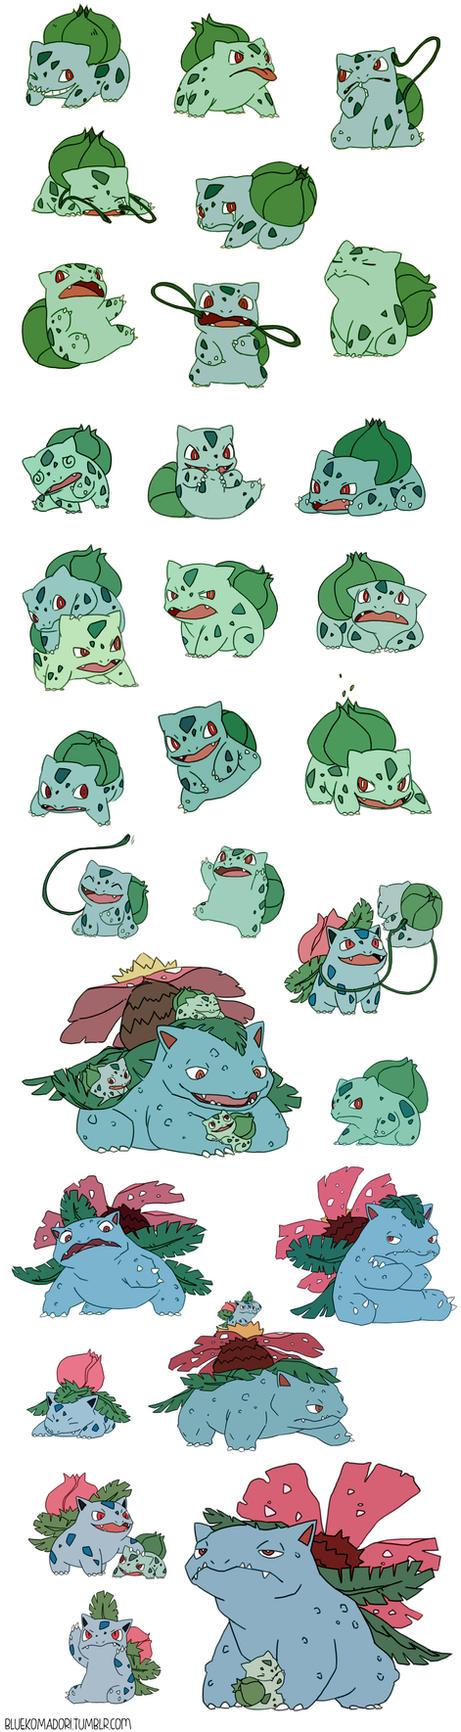 Bulbasaur commission by bluekomadori